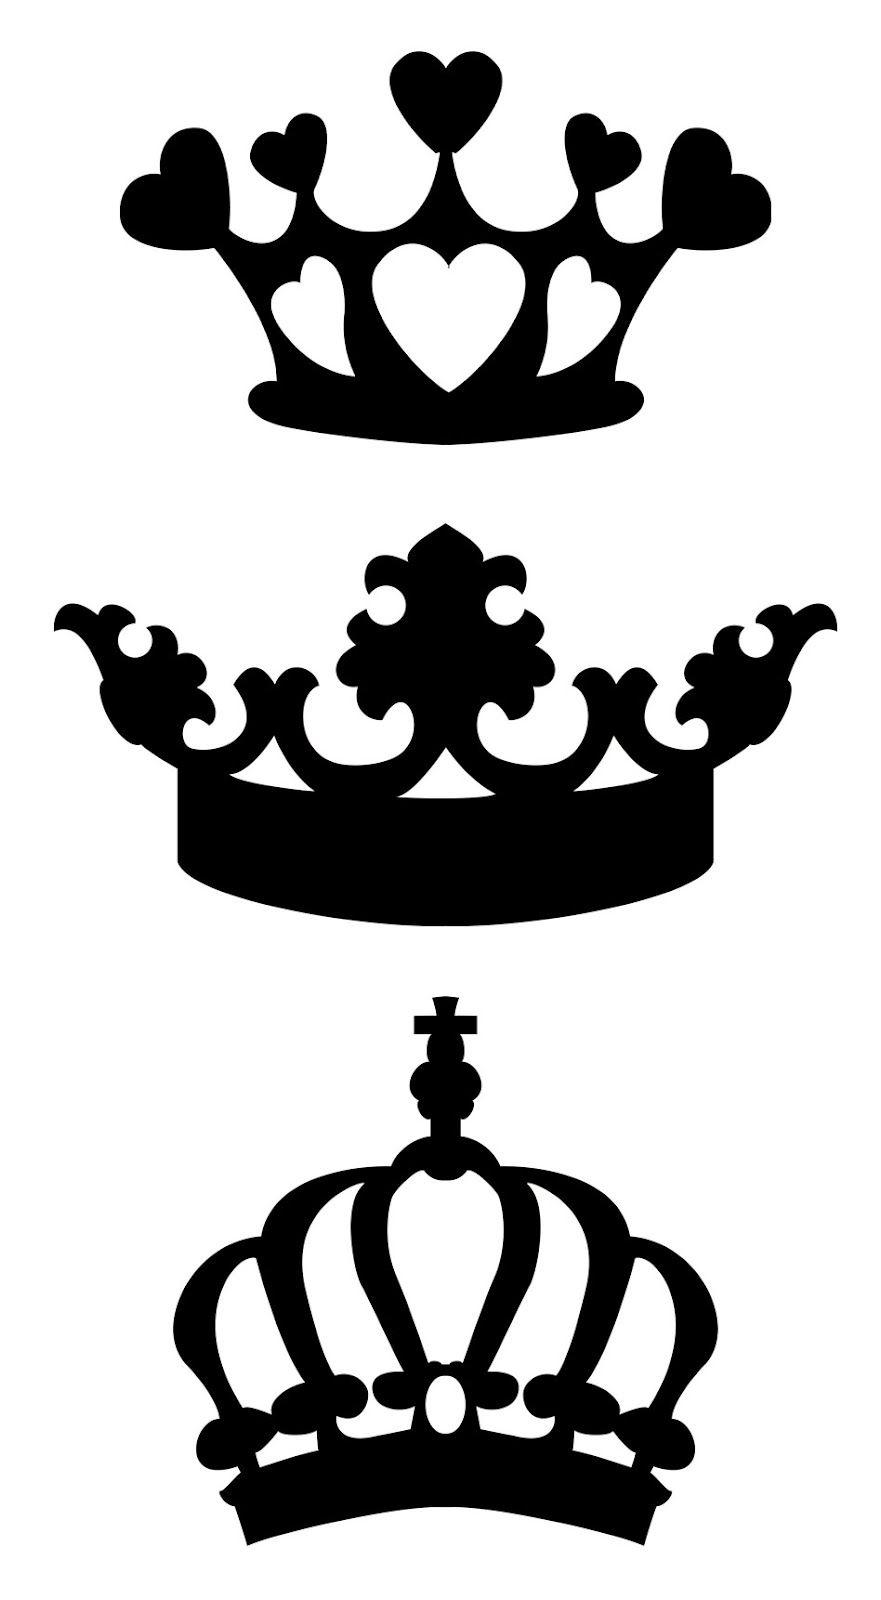 Free svg files of crowns | Coroa | Pinterest | Kronen, Plotten und ...